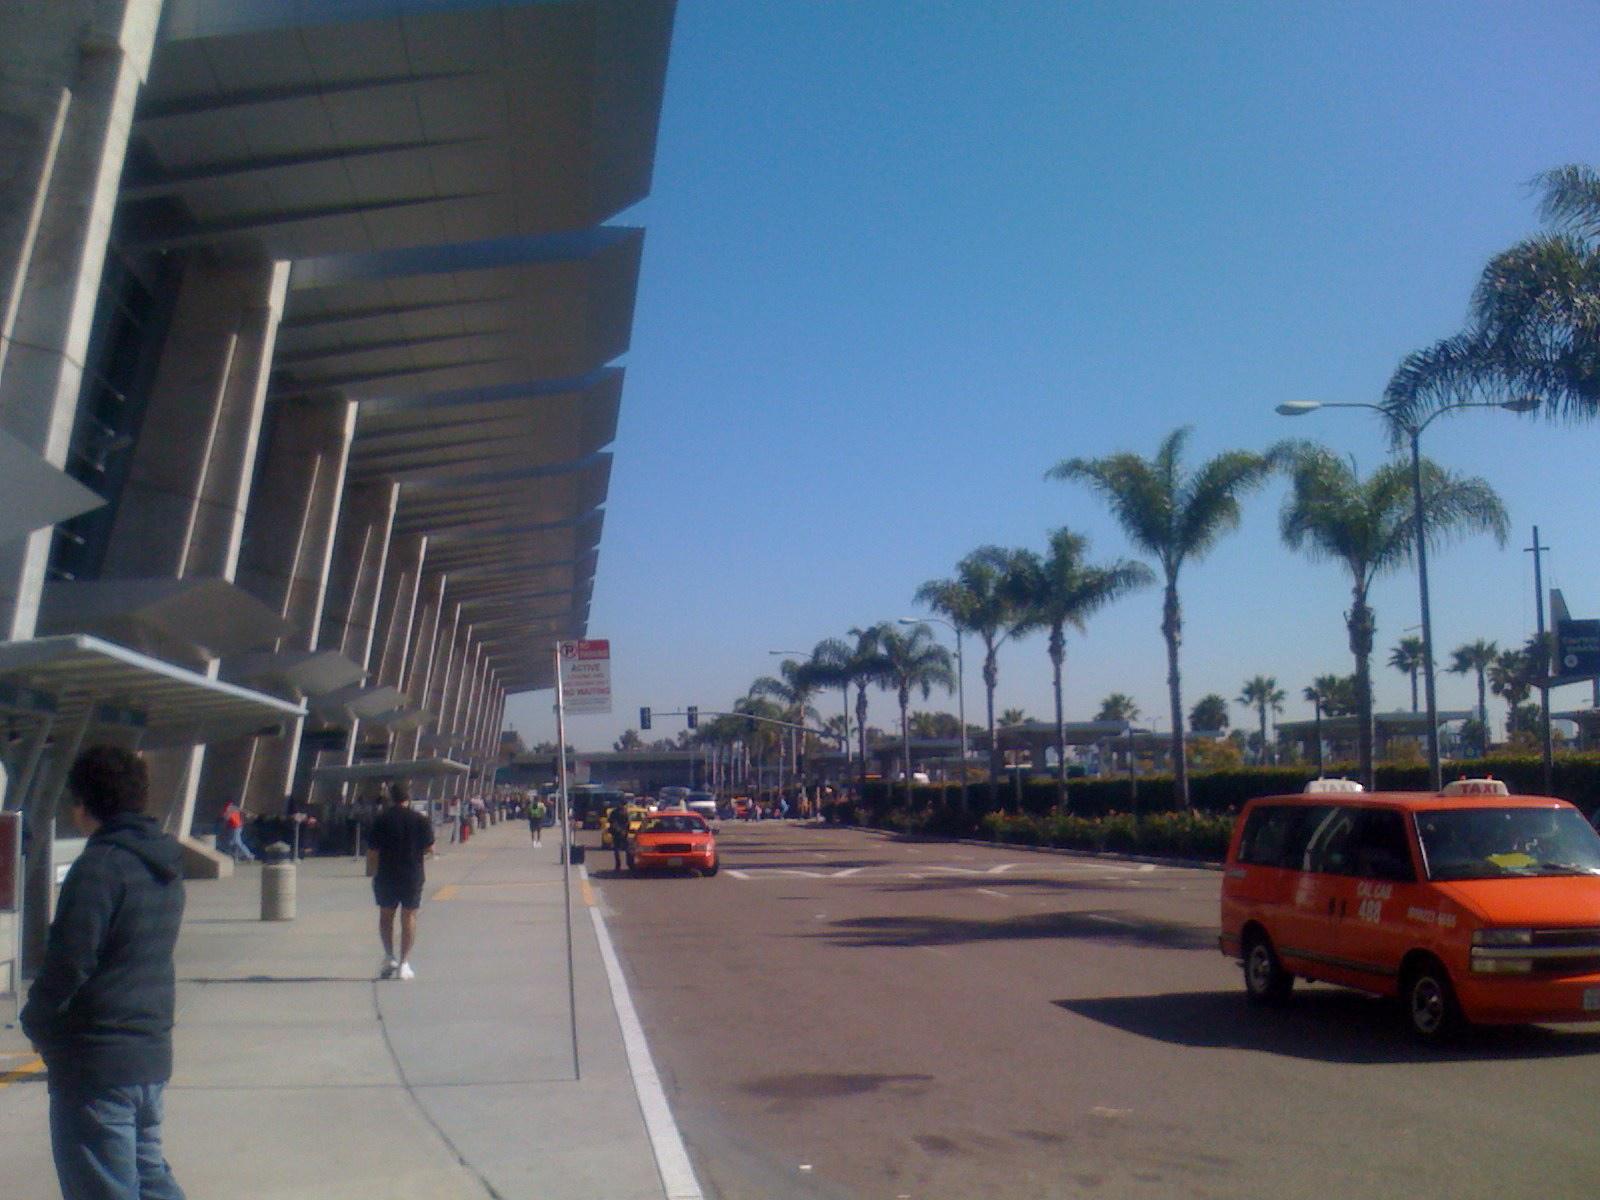 https://assets.sourcemedia.com/0a/45/433bbb8b4b56b3aa0e366d7838f1/san-diego-airport-terminal-2.jpg